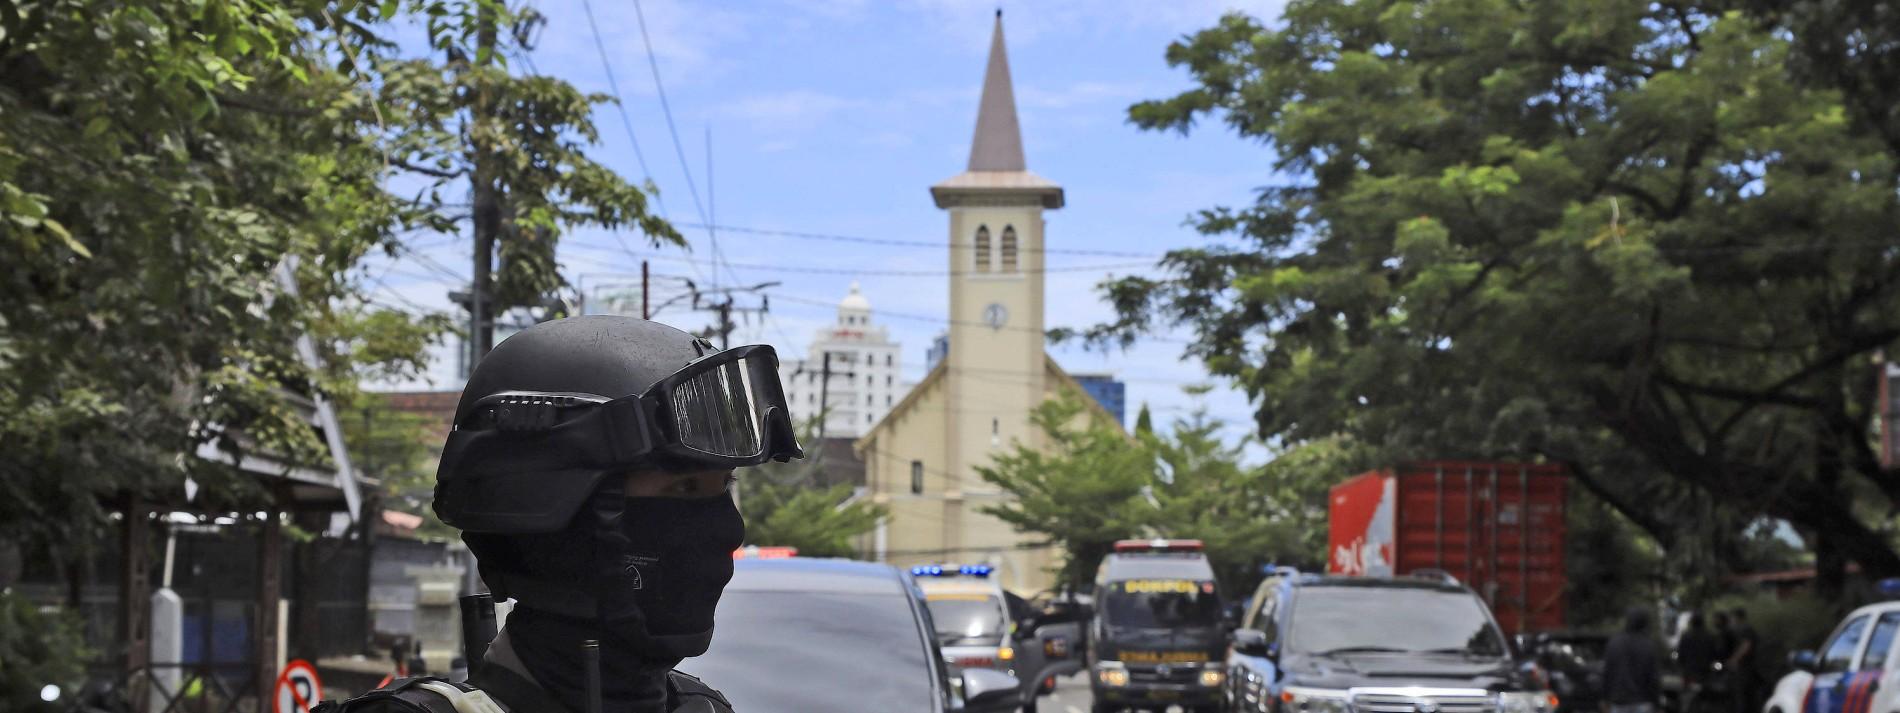 Bombe explodiert vor Kathedrale